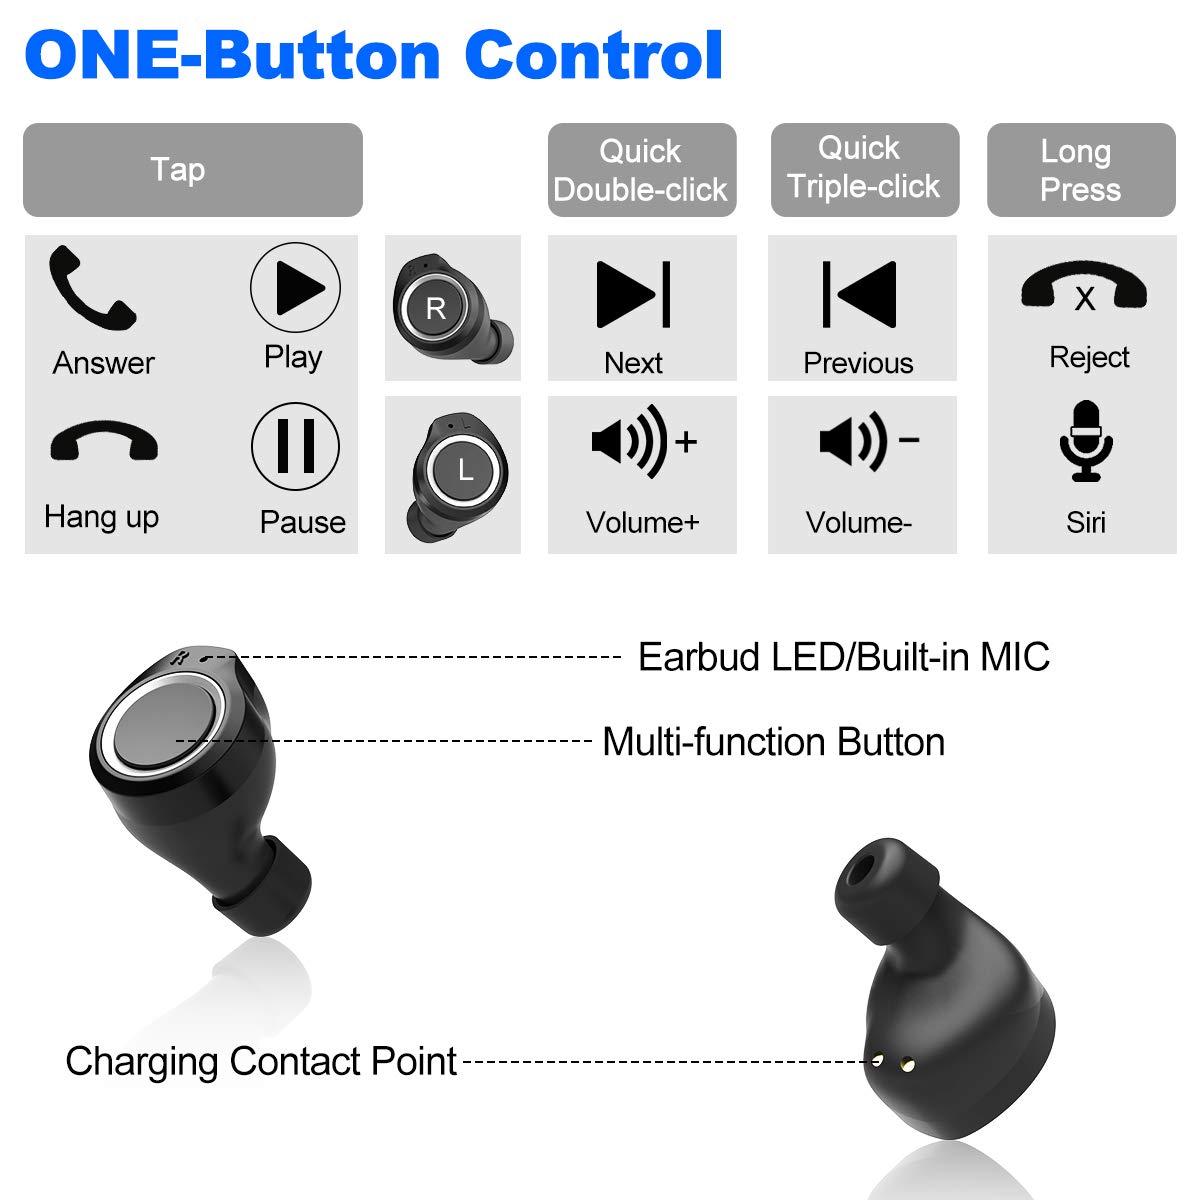 60eb714d2a6 Amazon.com: Bluetooth Headphones,LEUXE 5.0 True Wireless Earbuds Deep Bass  Stereo Sound Bluetooth Earphones Mini in-Ear Binaural Call Headset with  Built-in ...